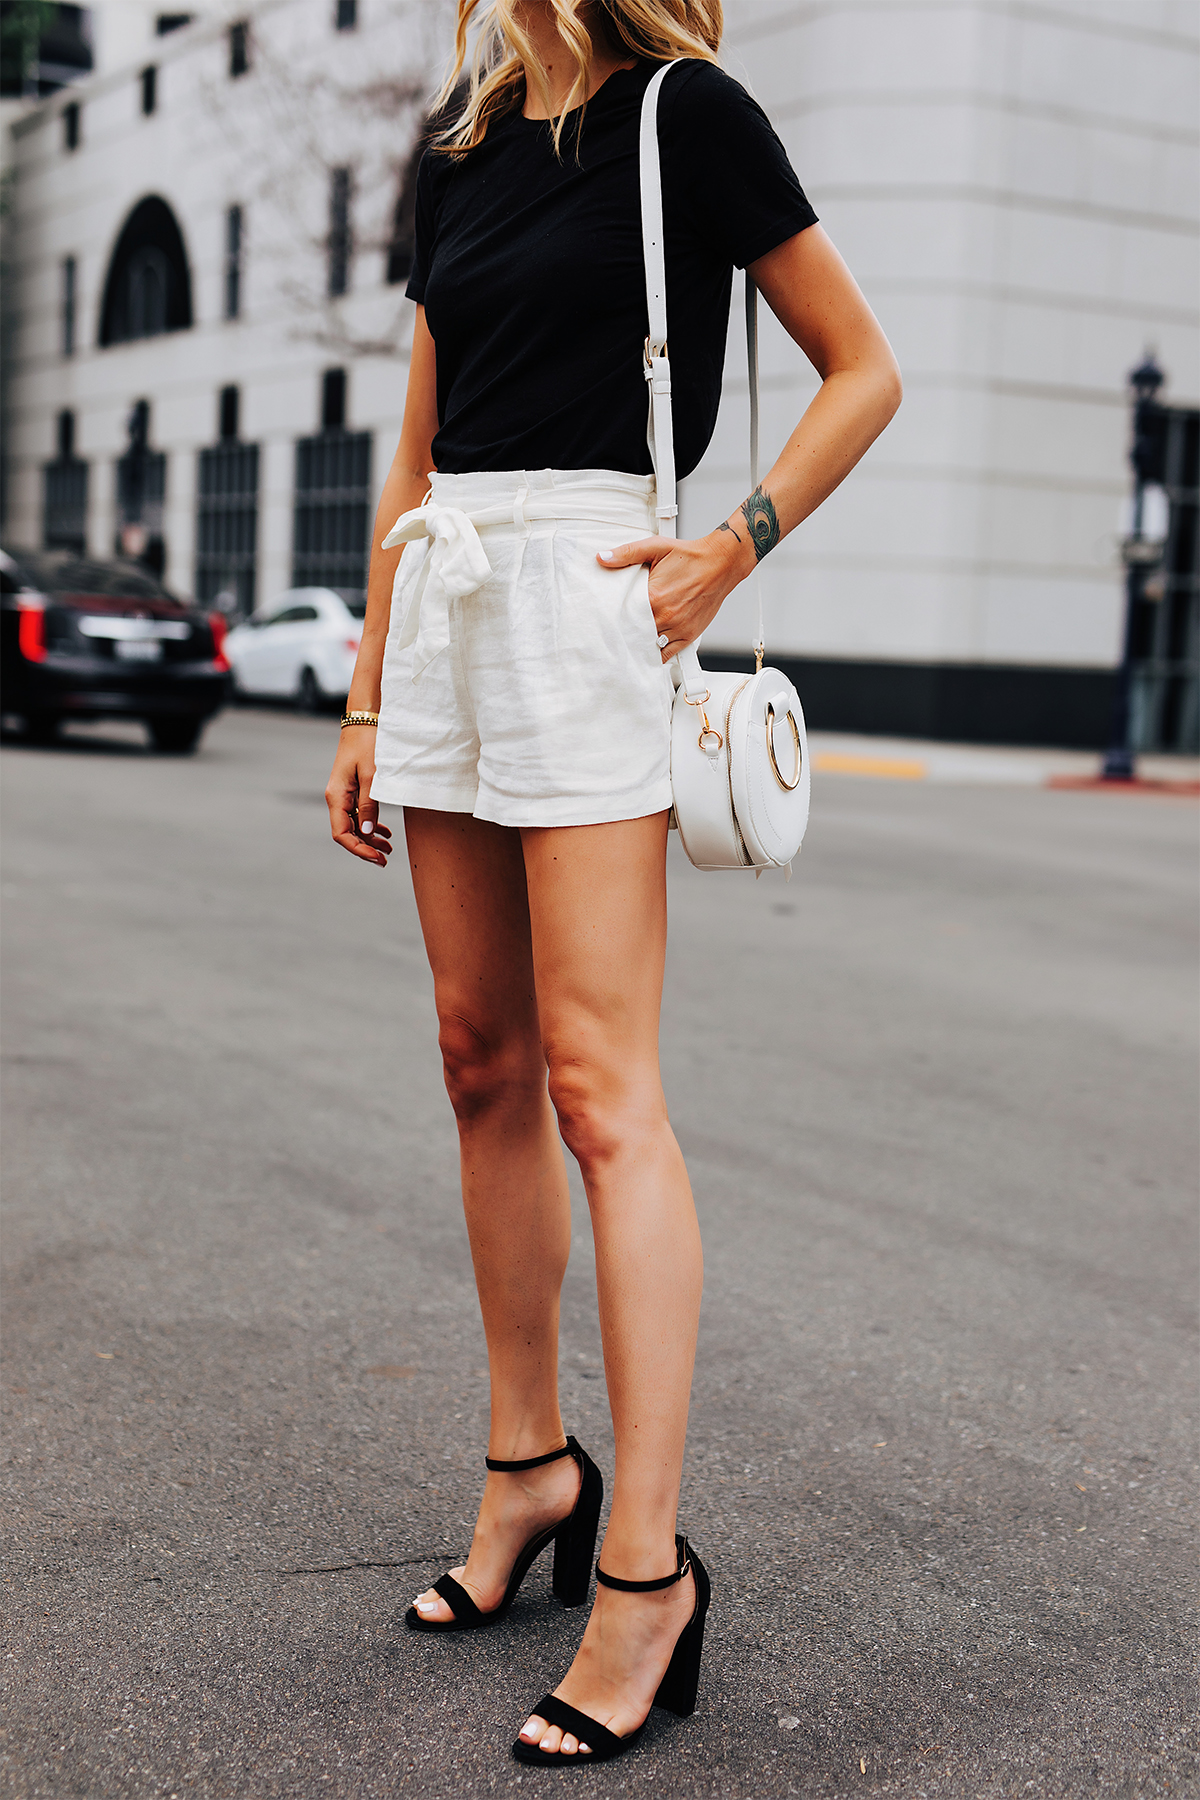 Fashion Jackson Wearing Black Tshirt White Tie Front Shorts Black Heeled Sandals White Circle Handbag